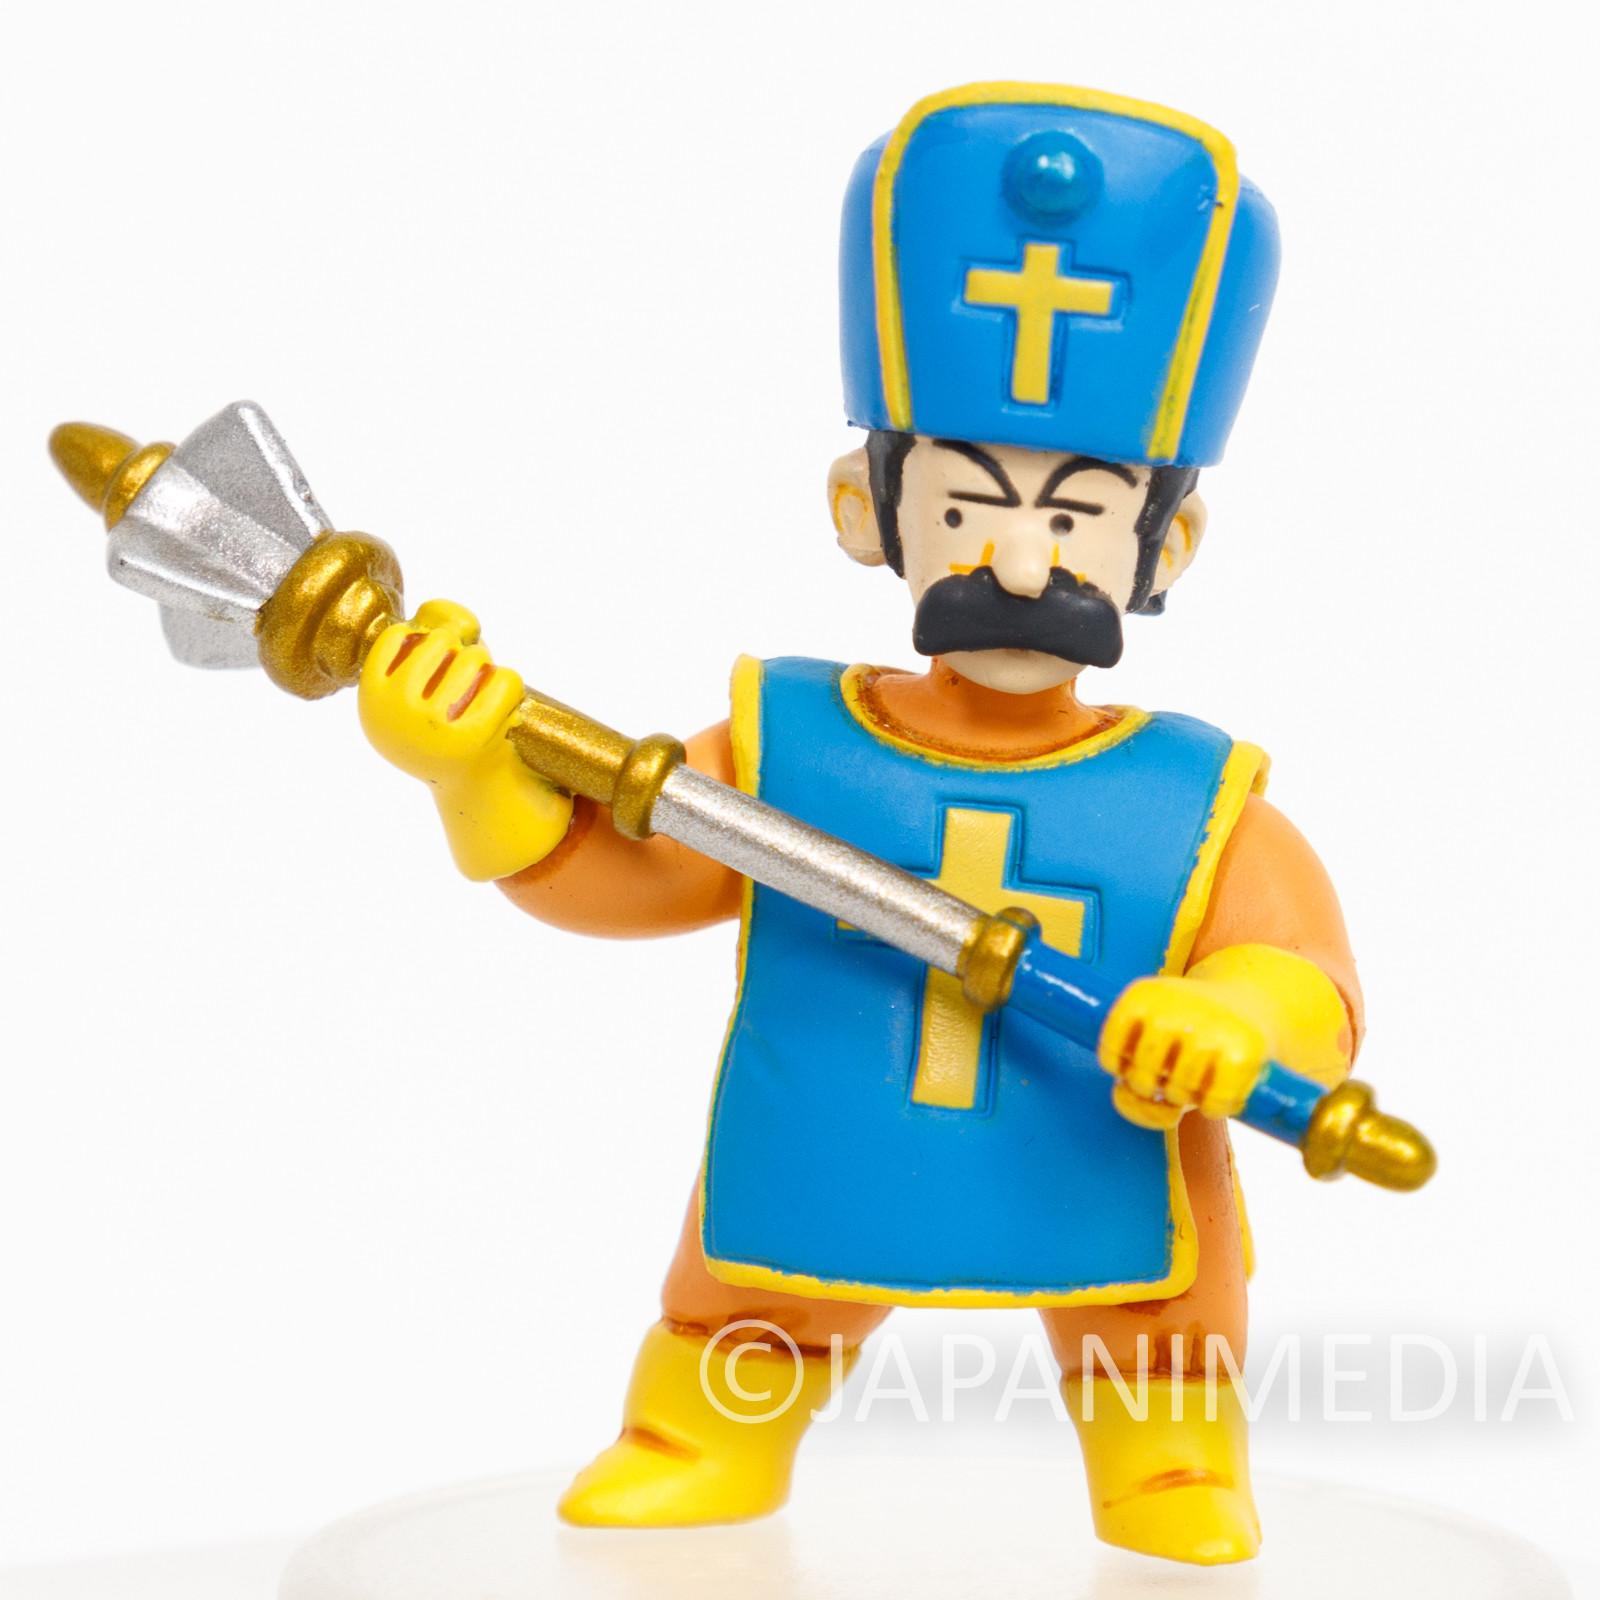 RARE Dragon Quest 3 Character Mascot Figure Priest Male GAME WARRIOR